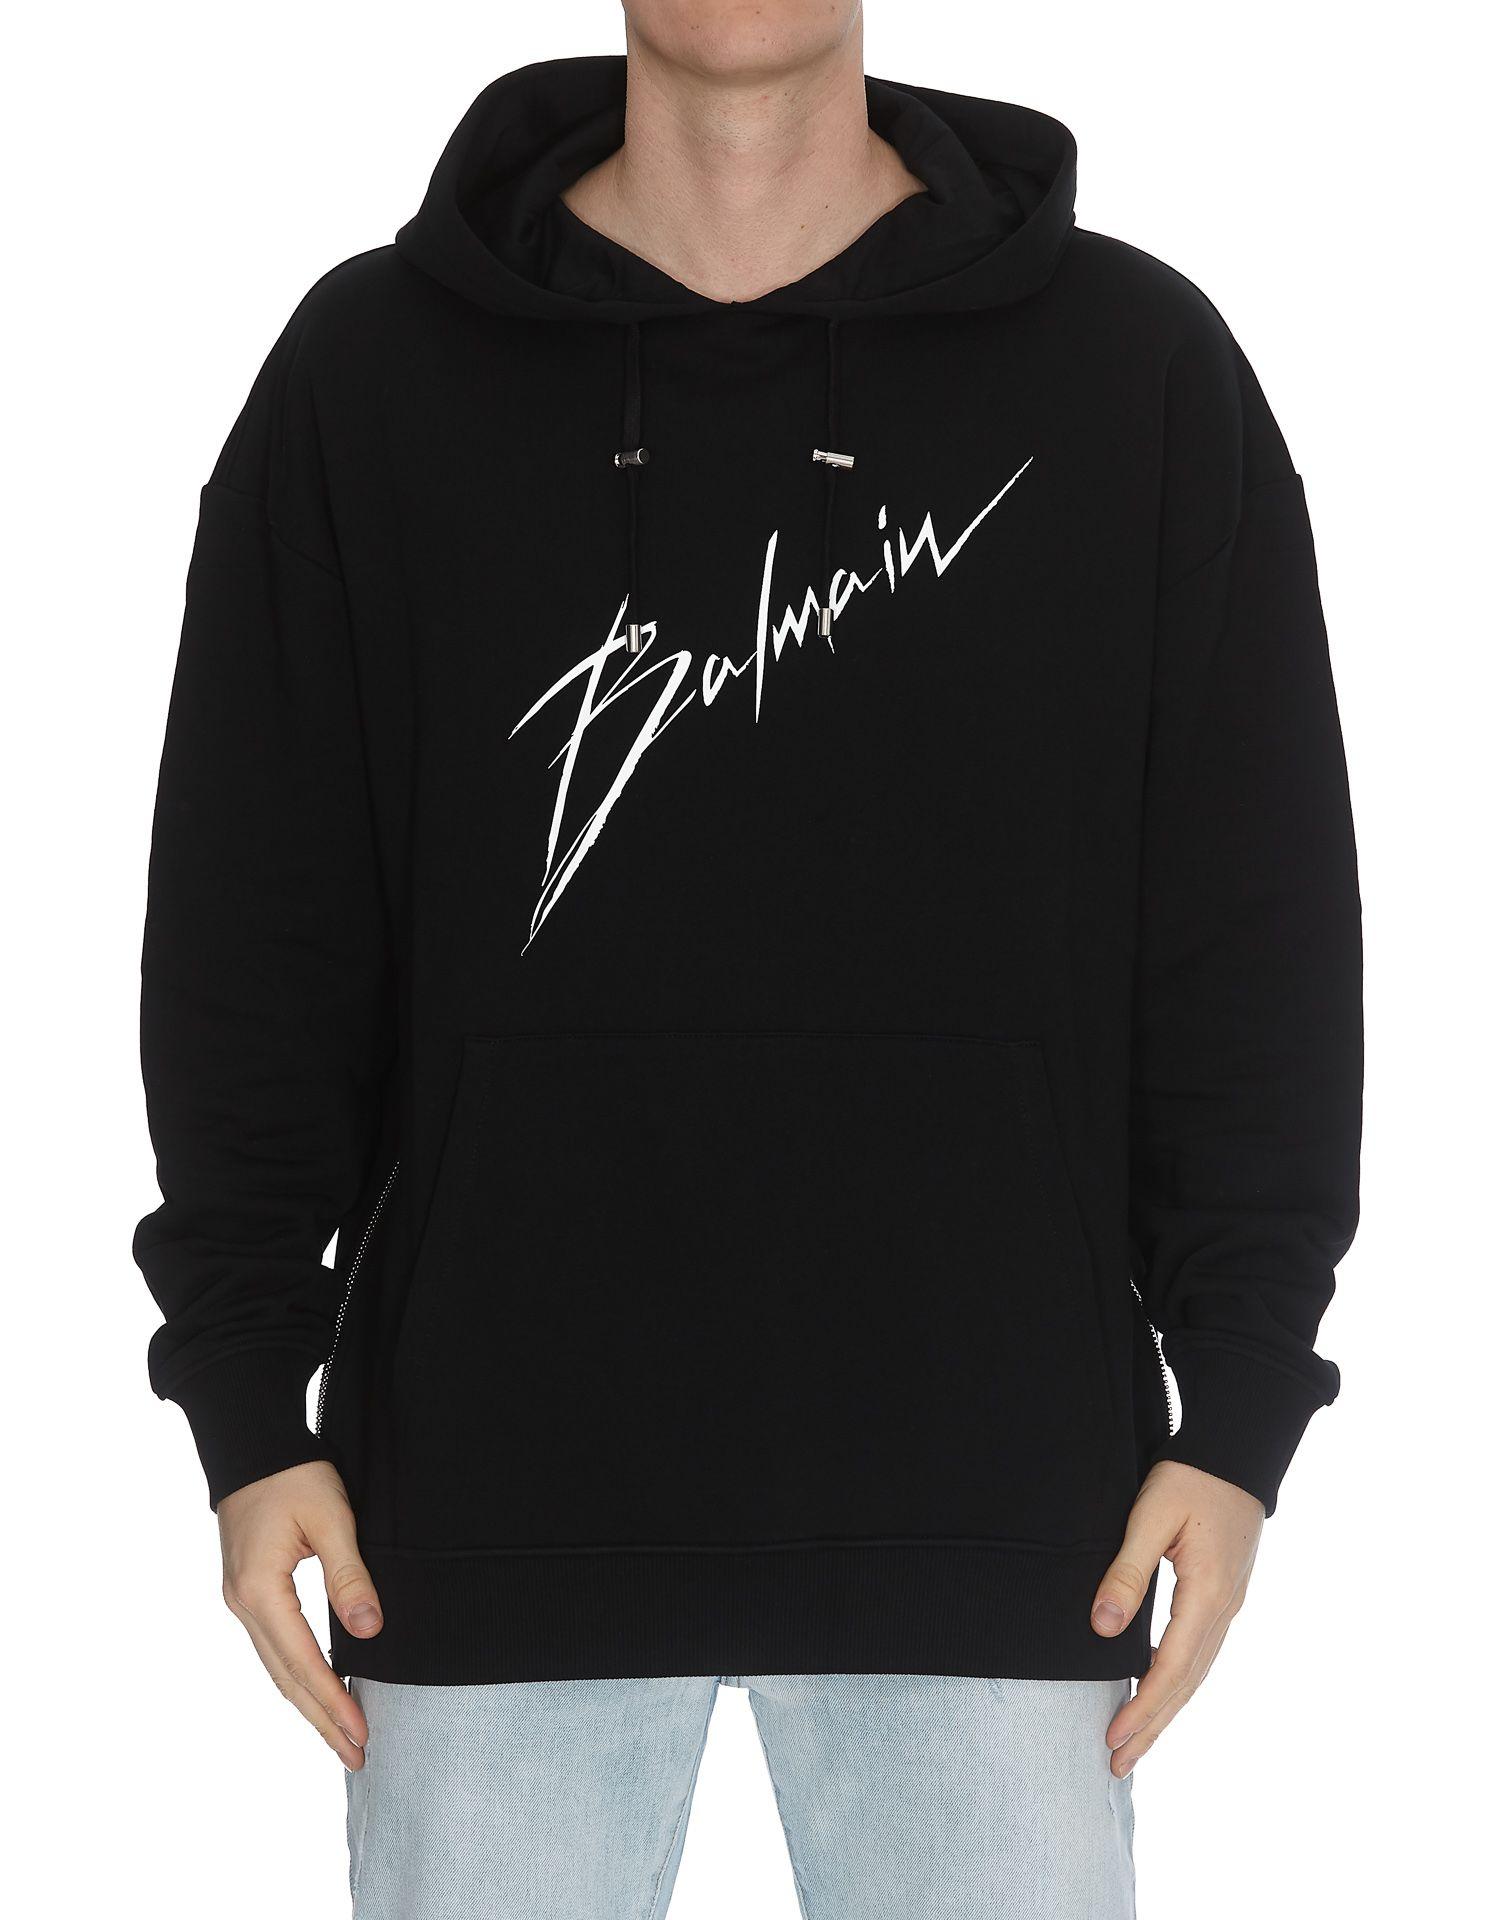 7e192f00 Balmain Balmain Sweat A Capuche Logo Balmain Signature - Black ...